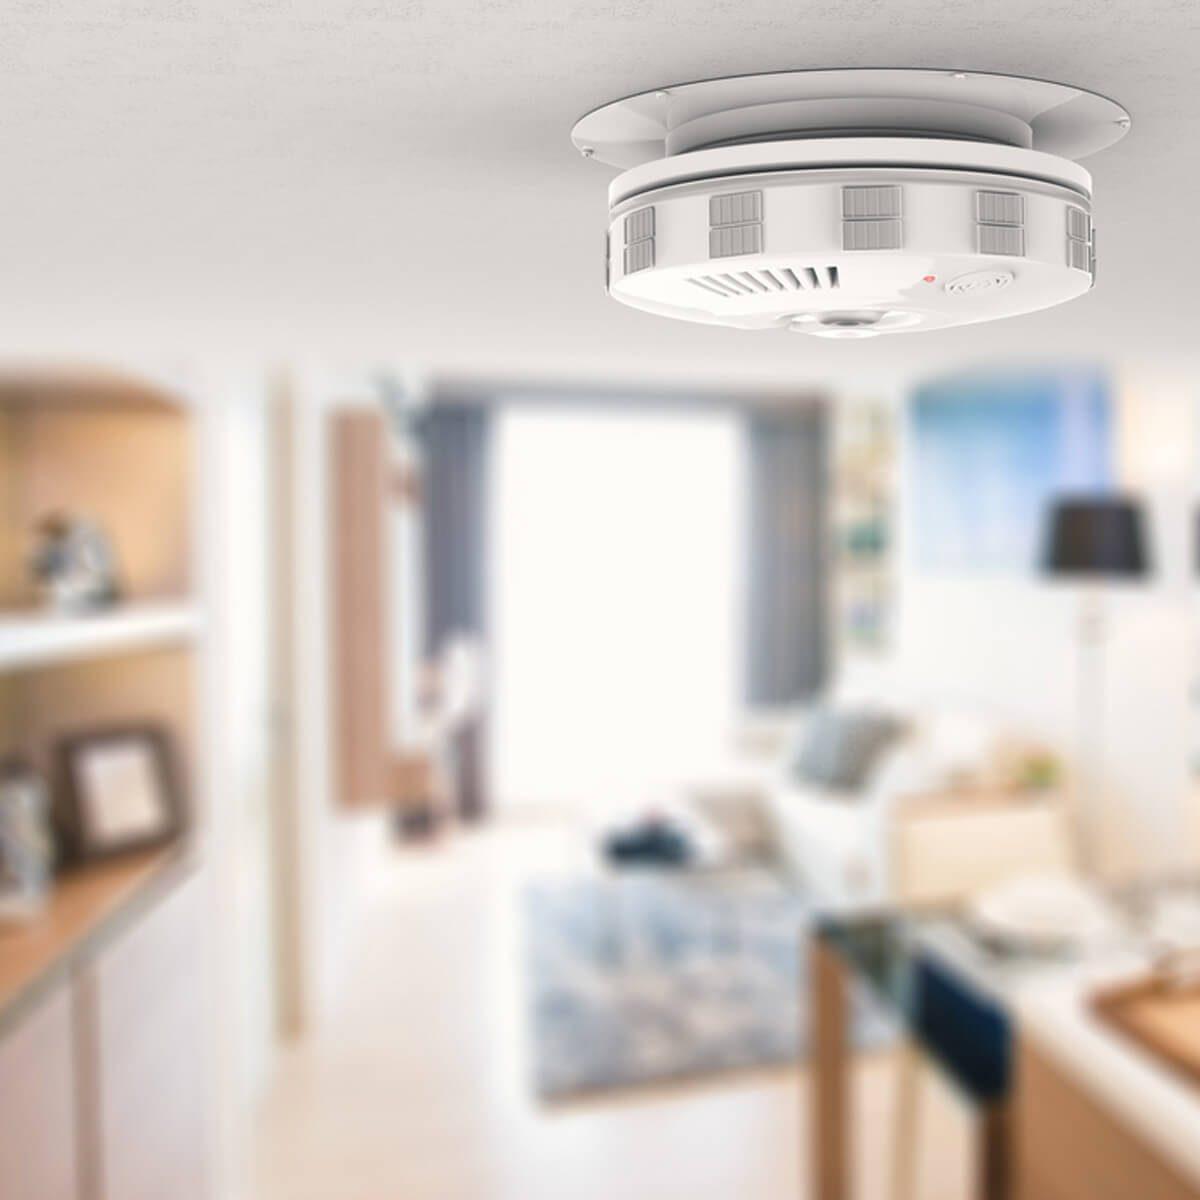 Check Your Smoke and CO Detectors